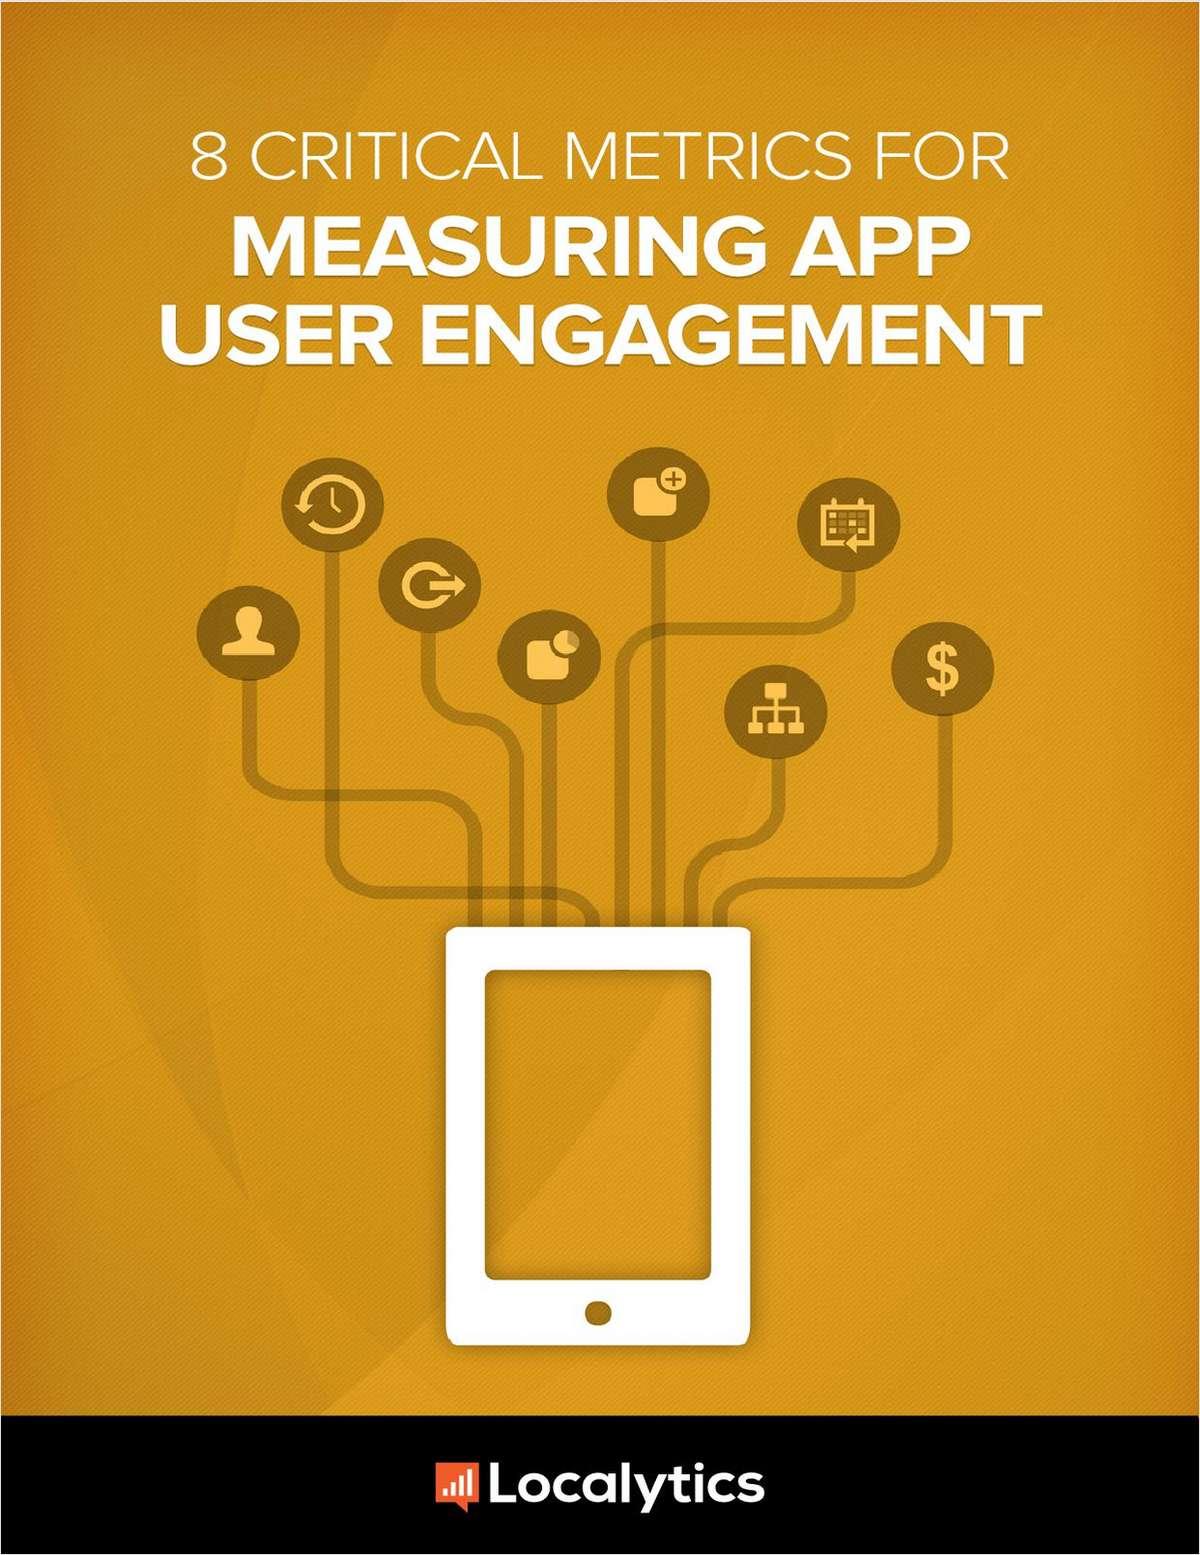 8 Critical App Engagement Metrics